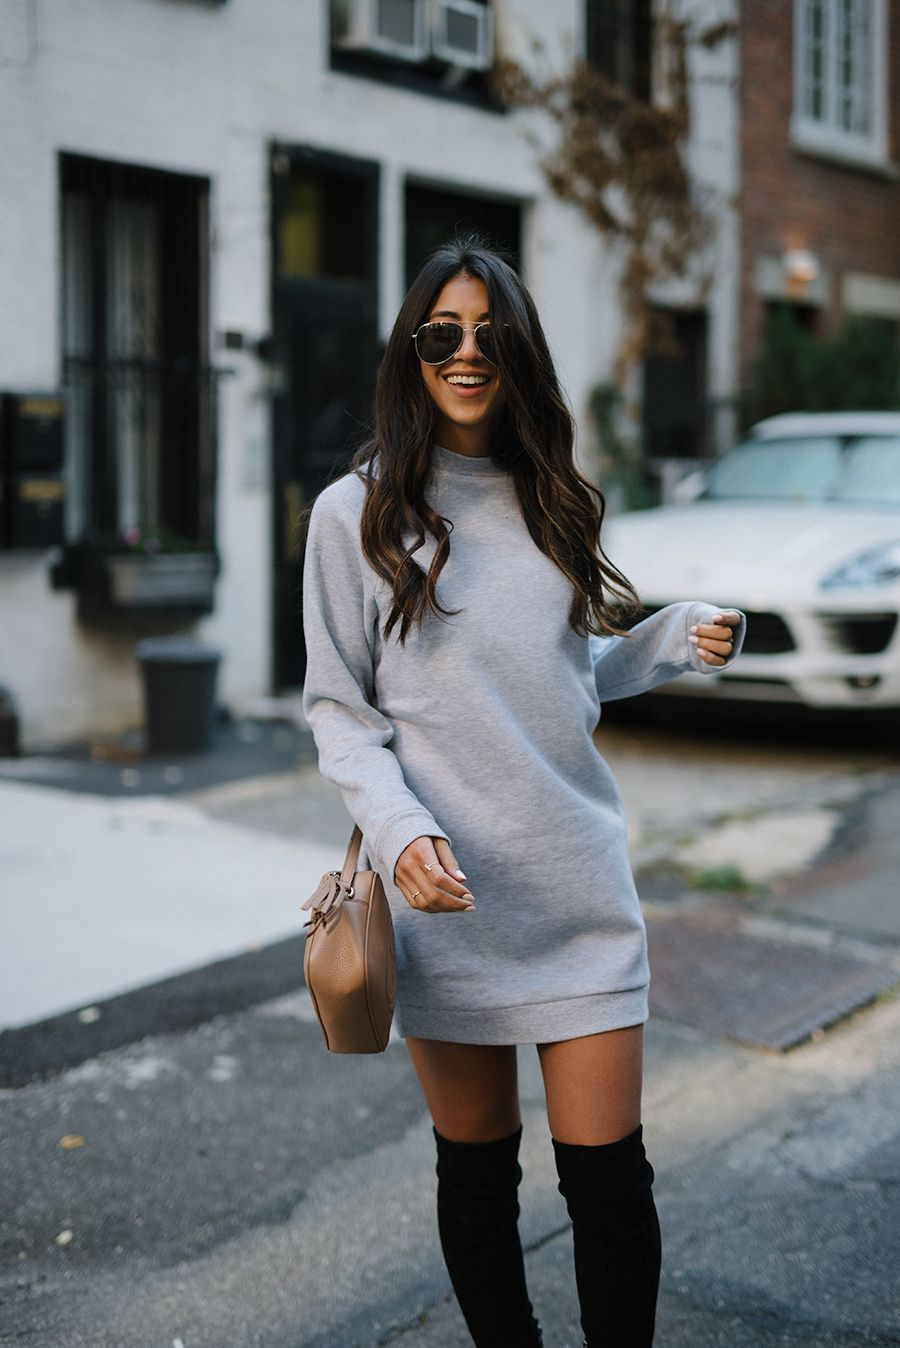 Kayla From Not Your Standard Http Thehautemommie Com Style Sweatshirt Dress Sweatshirt Dress Outfit Mini Dress Casual Dresses Casual Winter [ 1348 x 900 Pixel ]